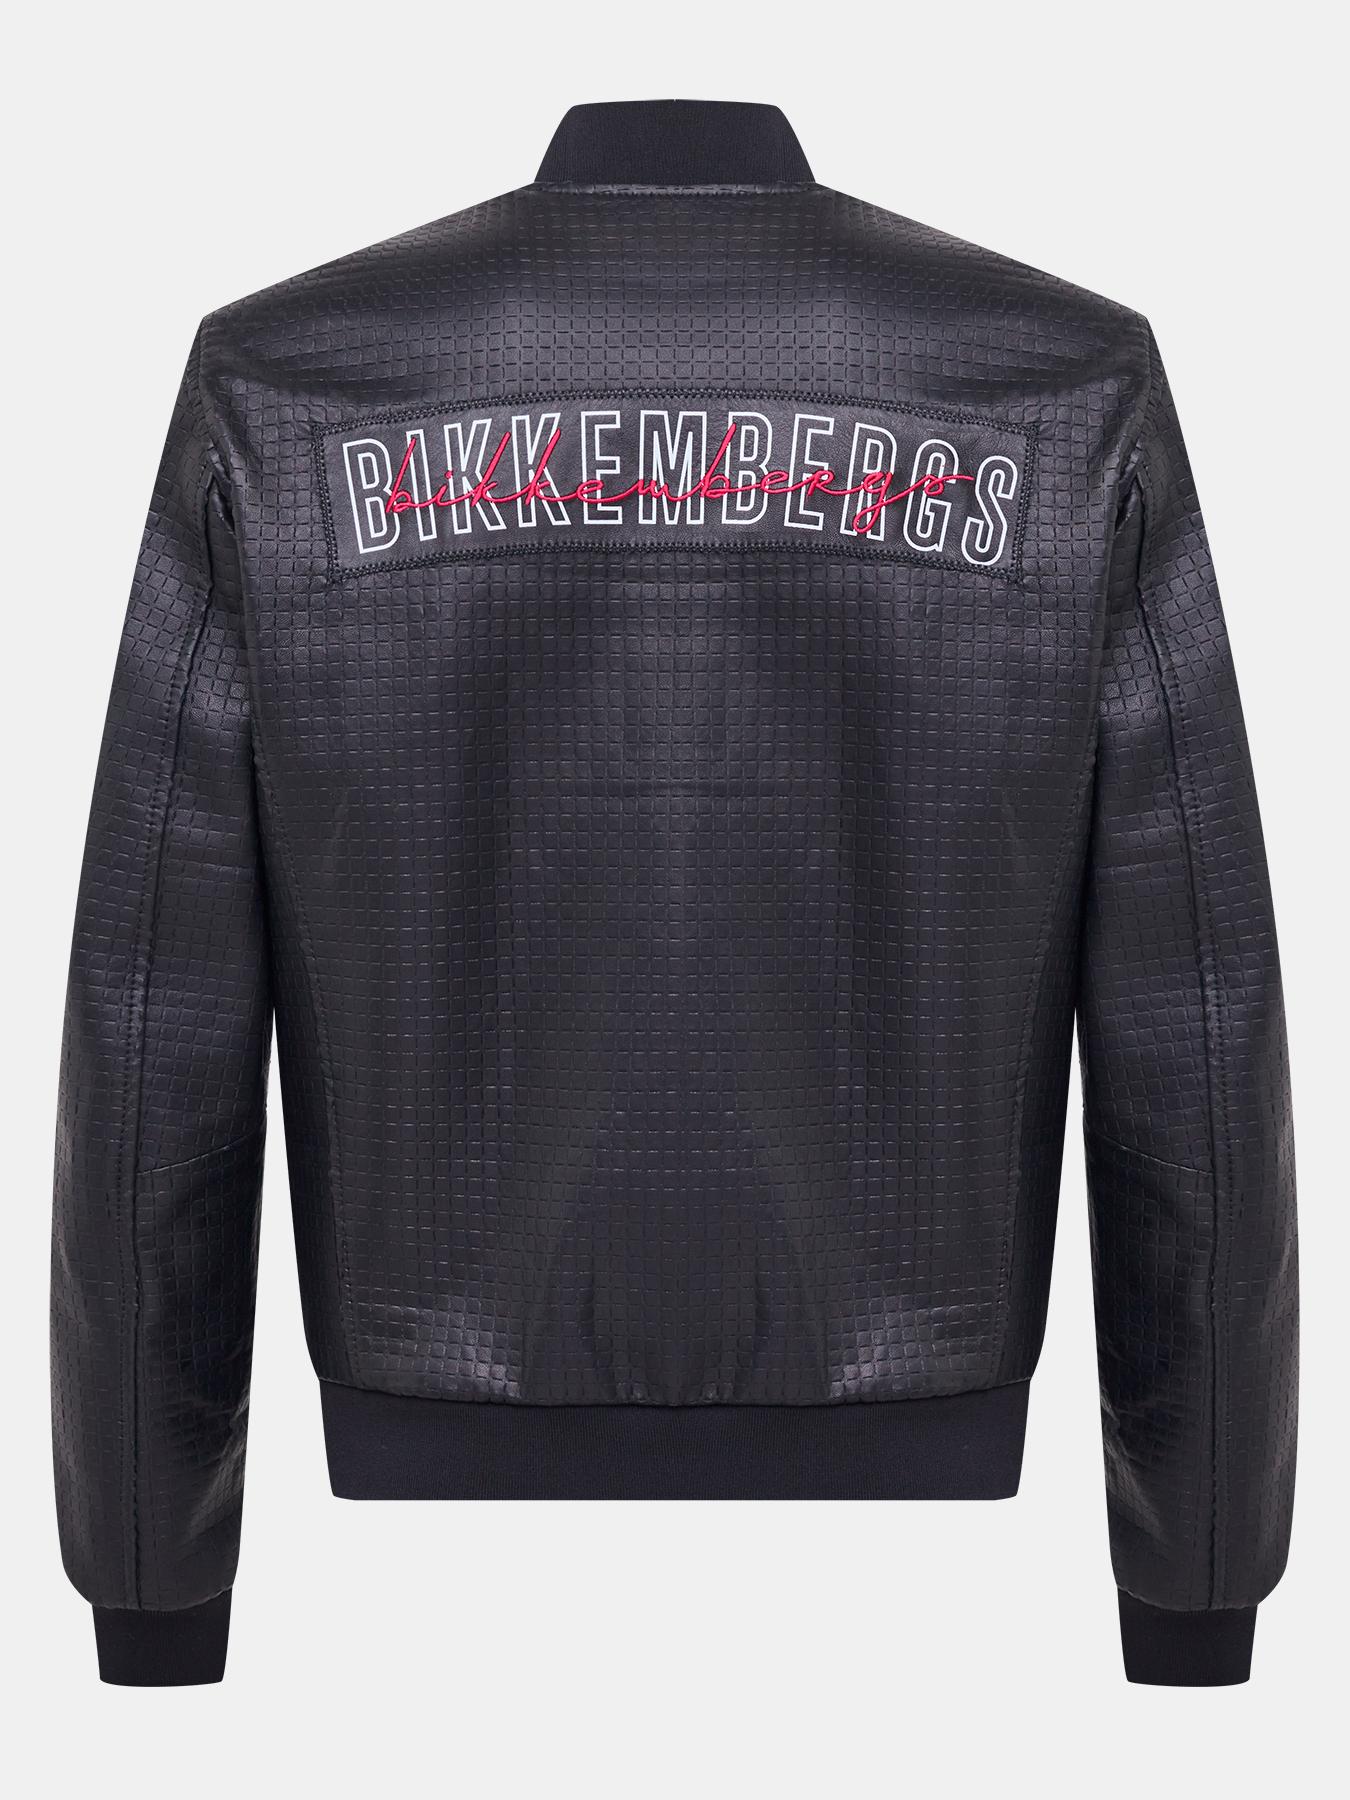 Куртка Bikkembergs Кожаная куртка